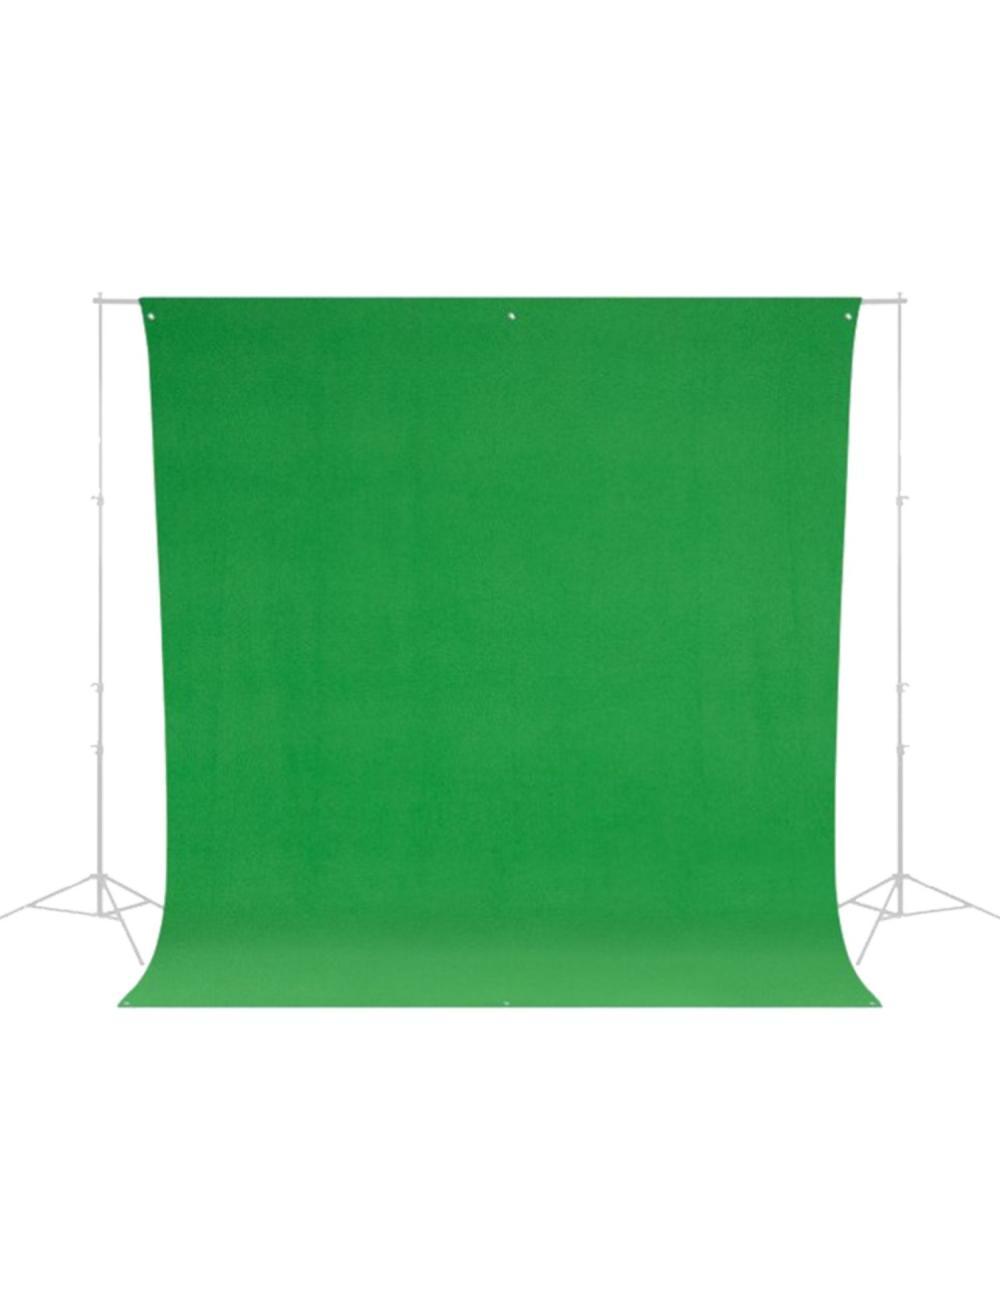 Westcott Wrinkle-Resistant Backdrop - Chroma-Key Green